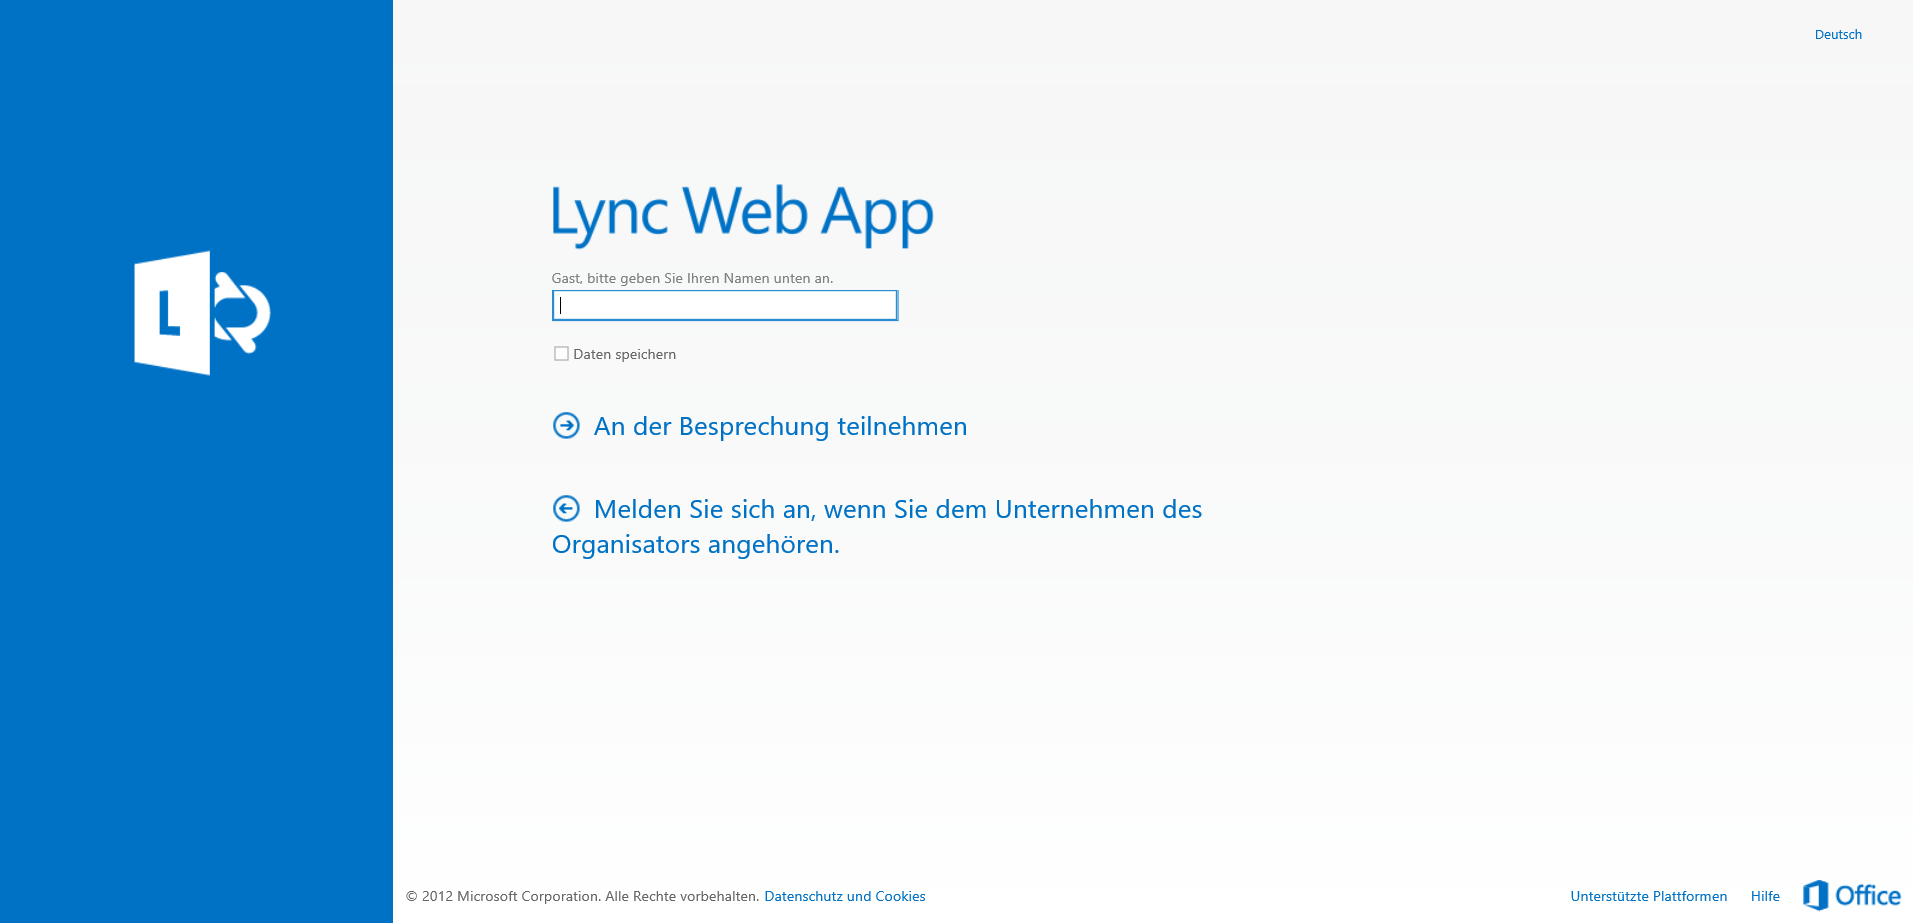 lyncwebapp_02